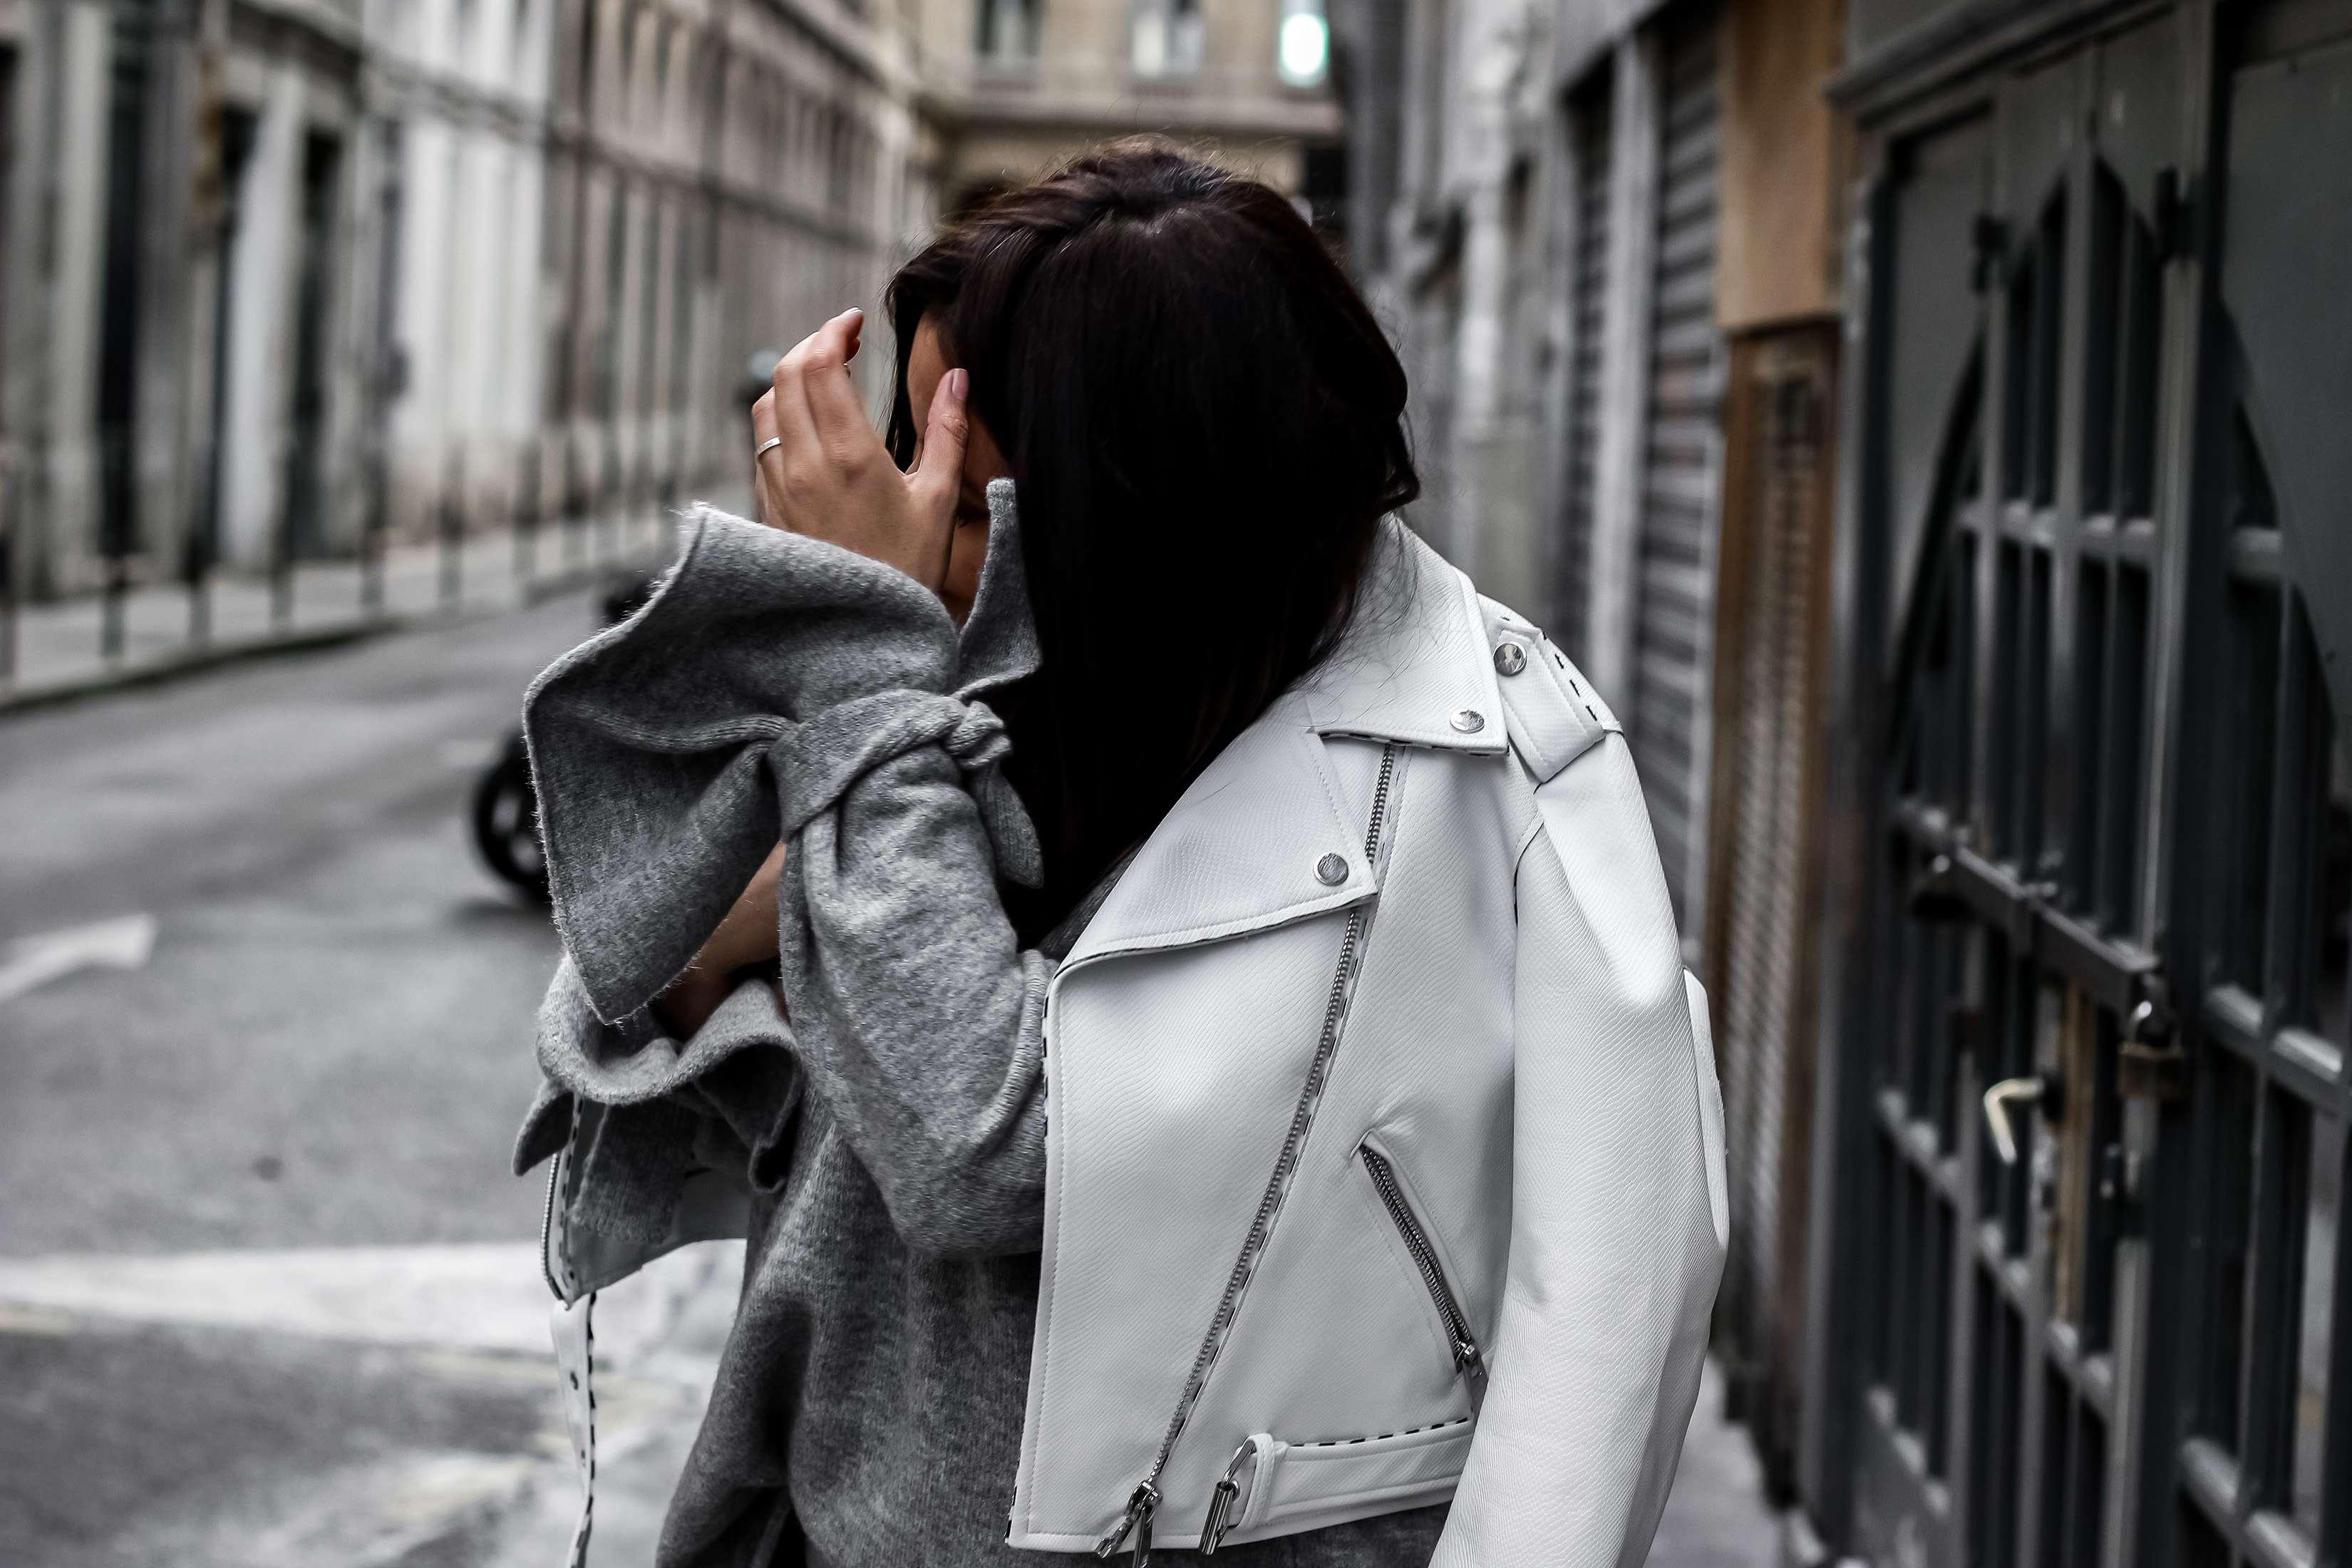 pantalon bandes, zara, perfecto zara, perfecto blanc, blog mode, the green ananas, résilles, chaussures stella, elyse stella, shein, sac femme, white